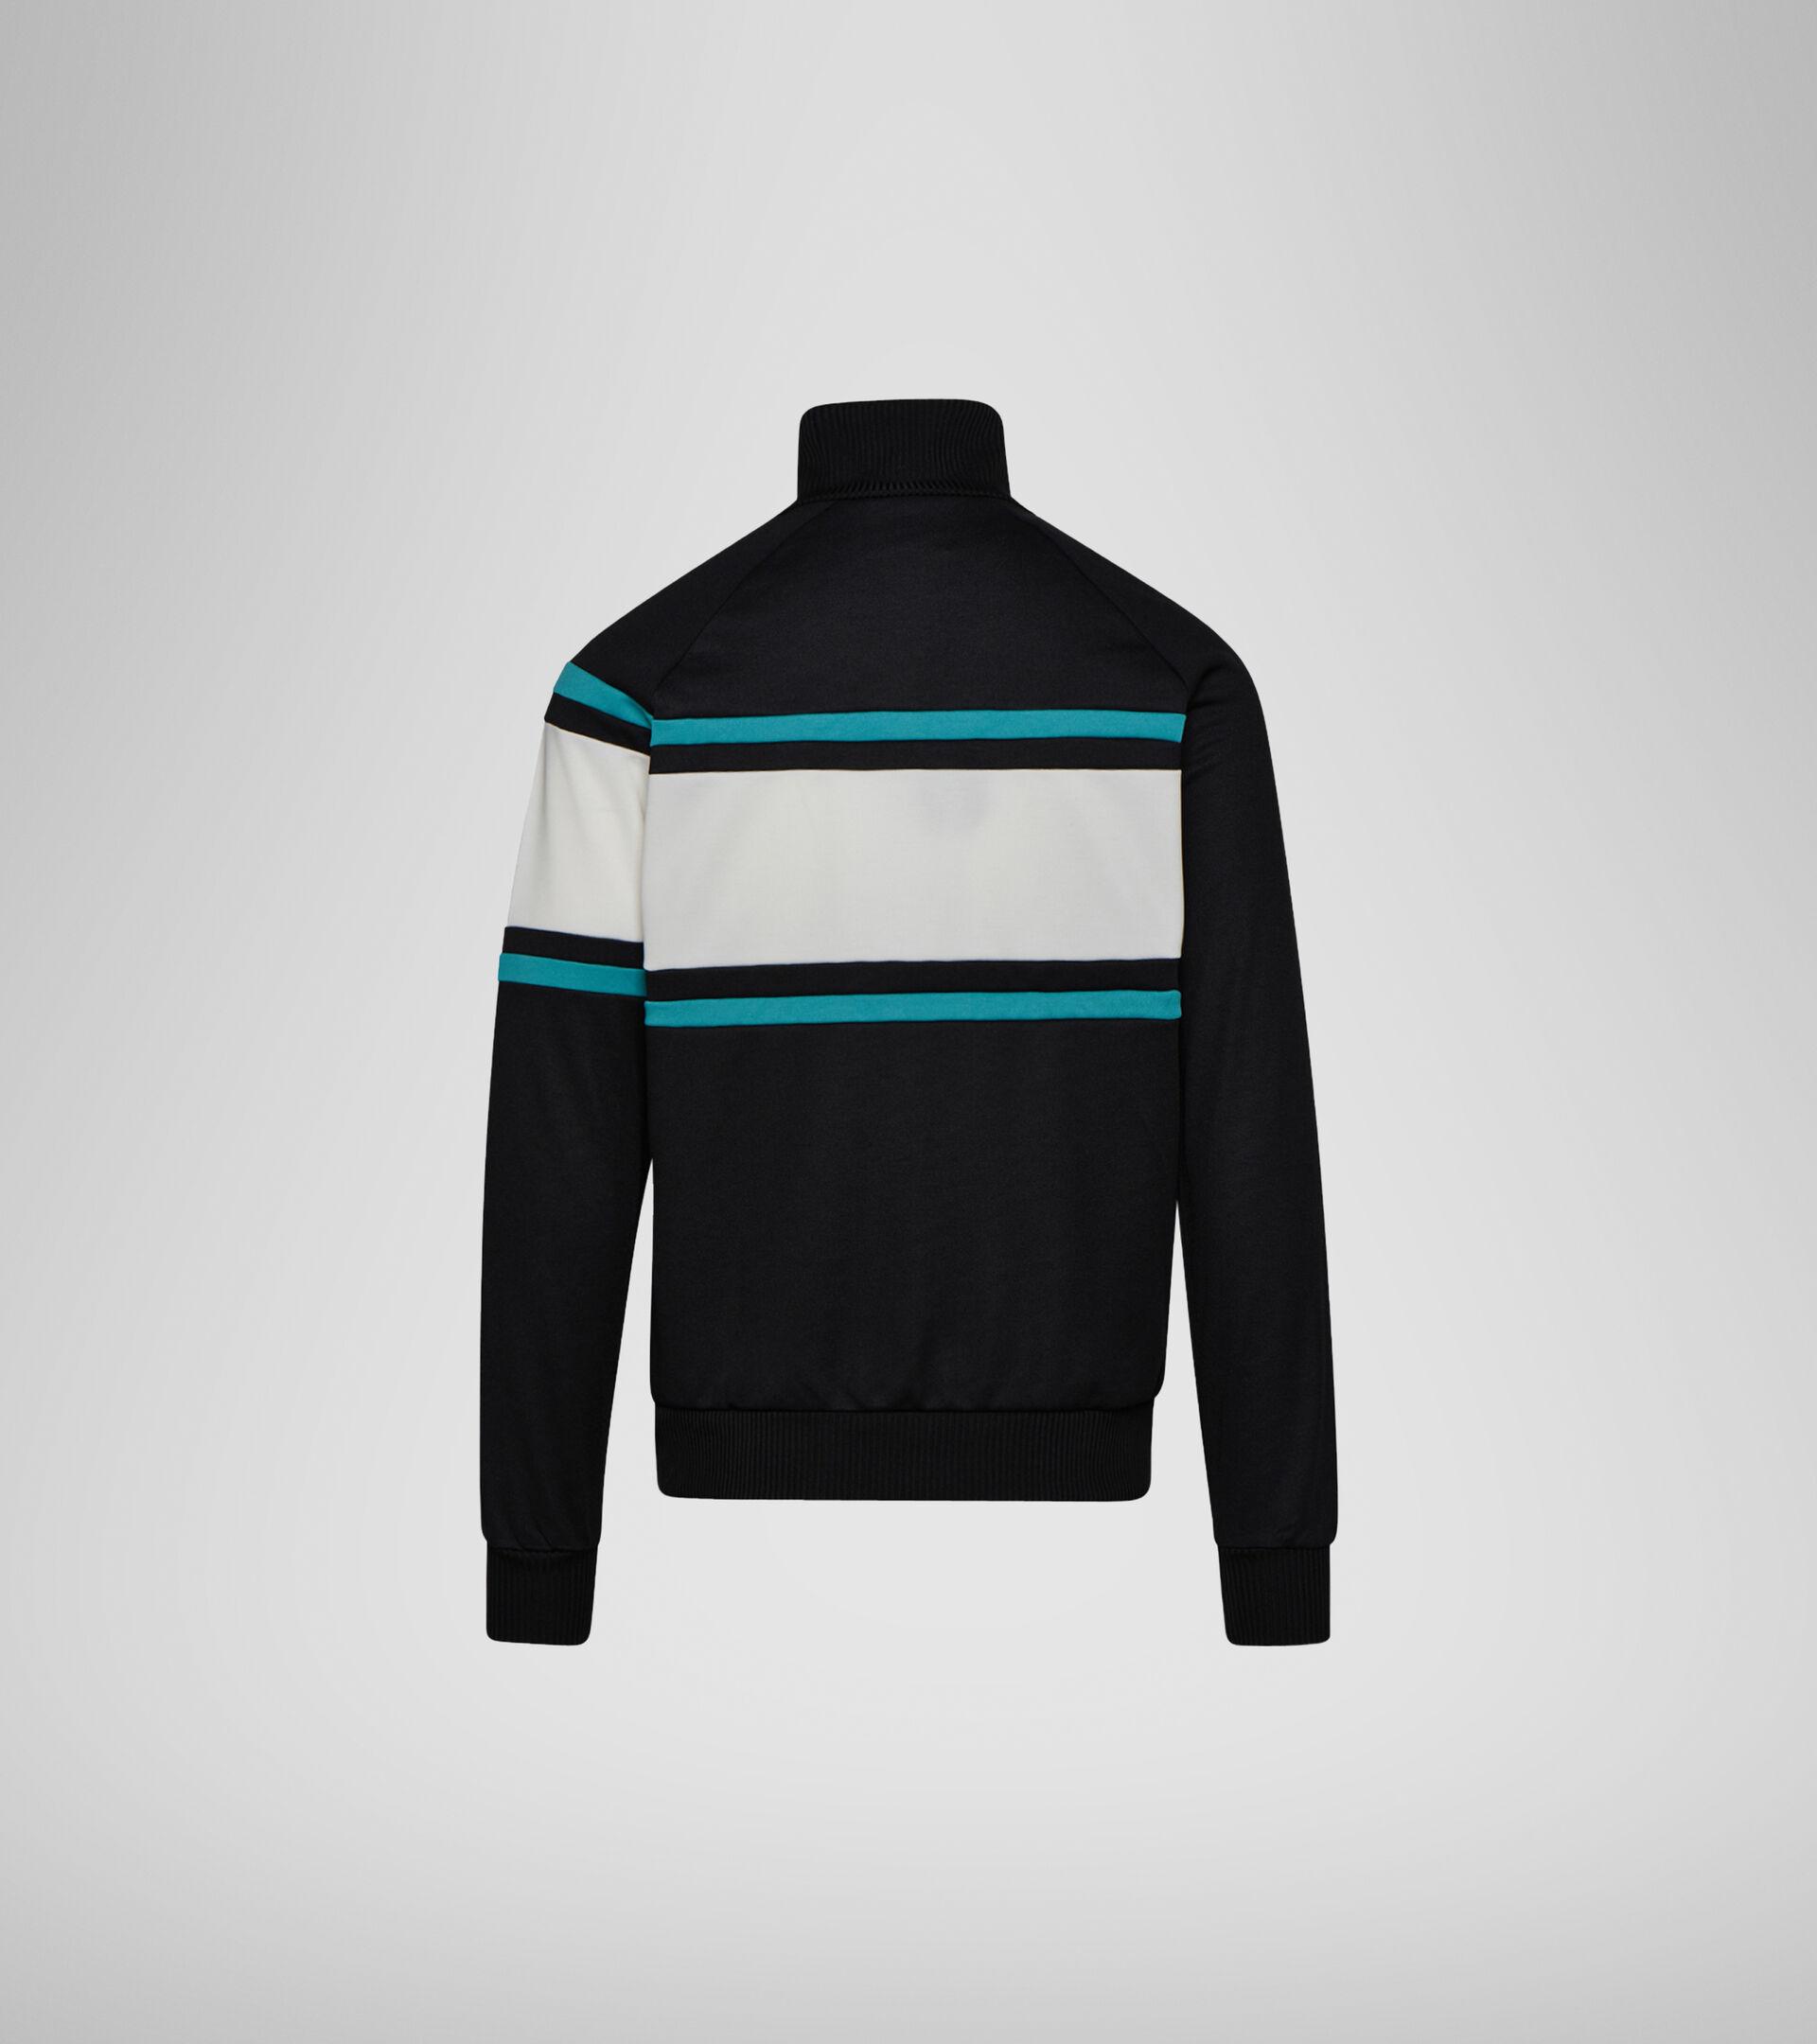 Apparel Sportswear UOMO JACKET 80S NERO/VERDE ACQUA/BIANCO LATTE Diadora